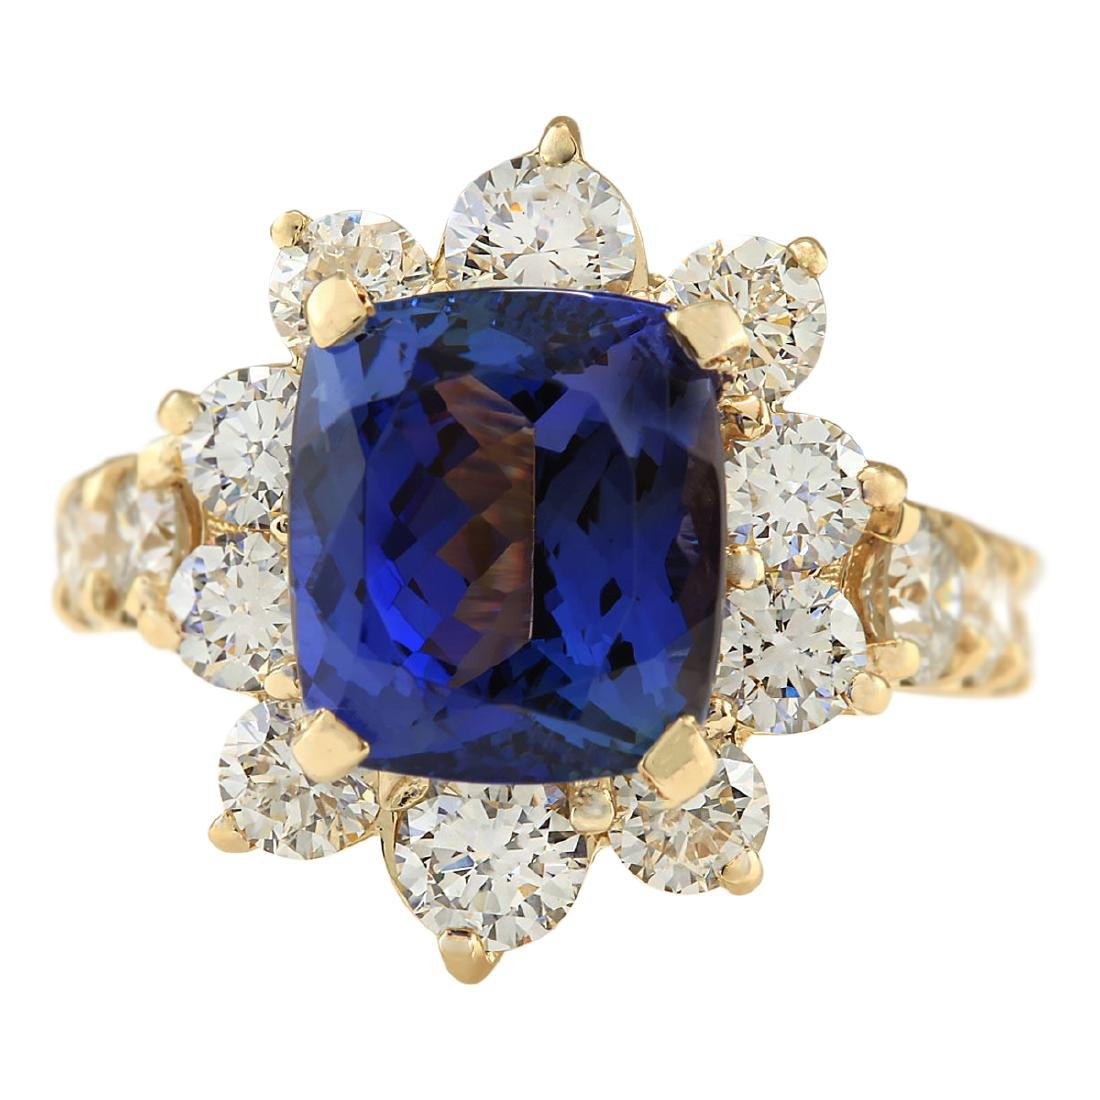 7.83 CTW Natural Tanzanite And Diamond Ring In 18K